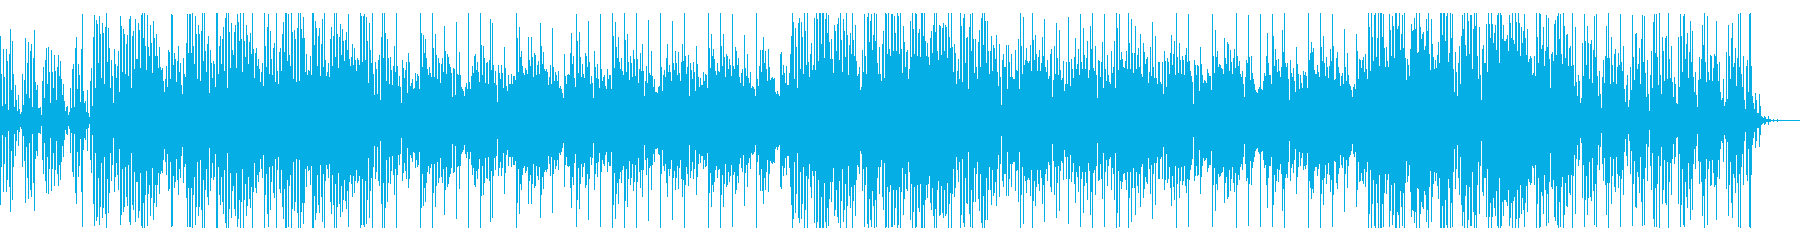 OddMachineの再生済みの波形